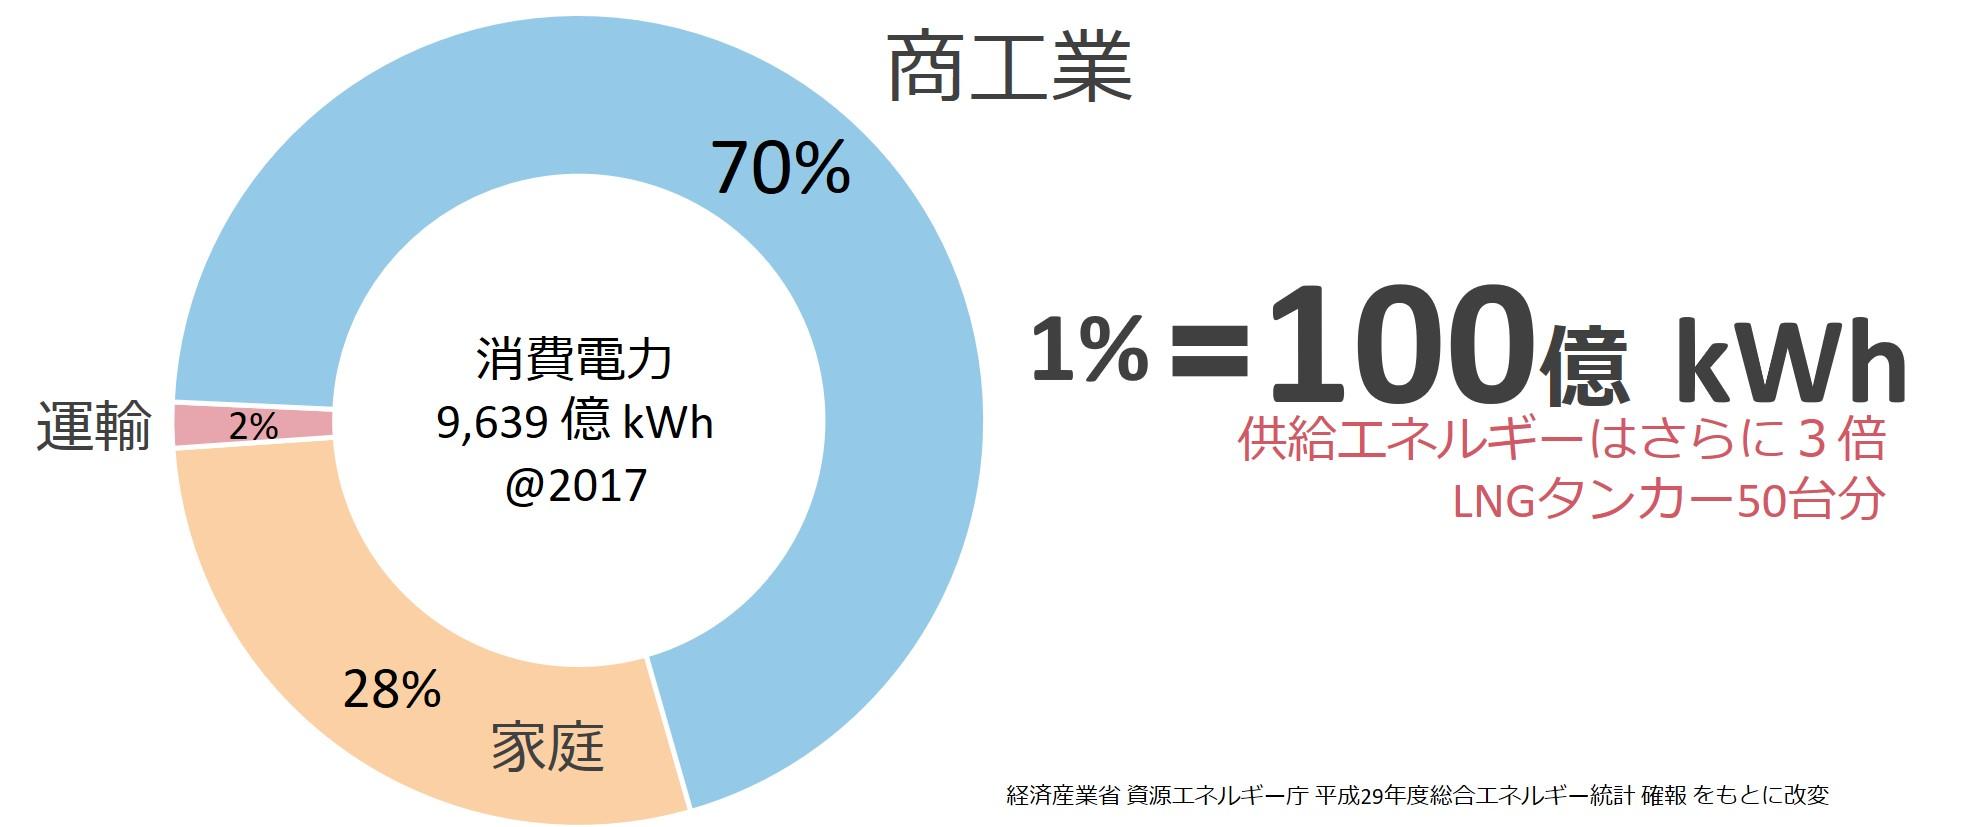 日本の消費電力の用途内訳